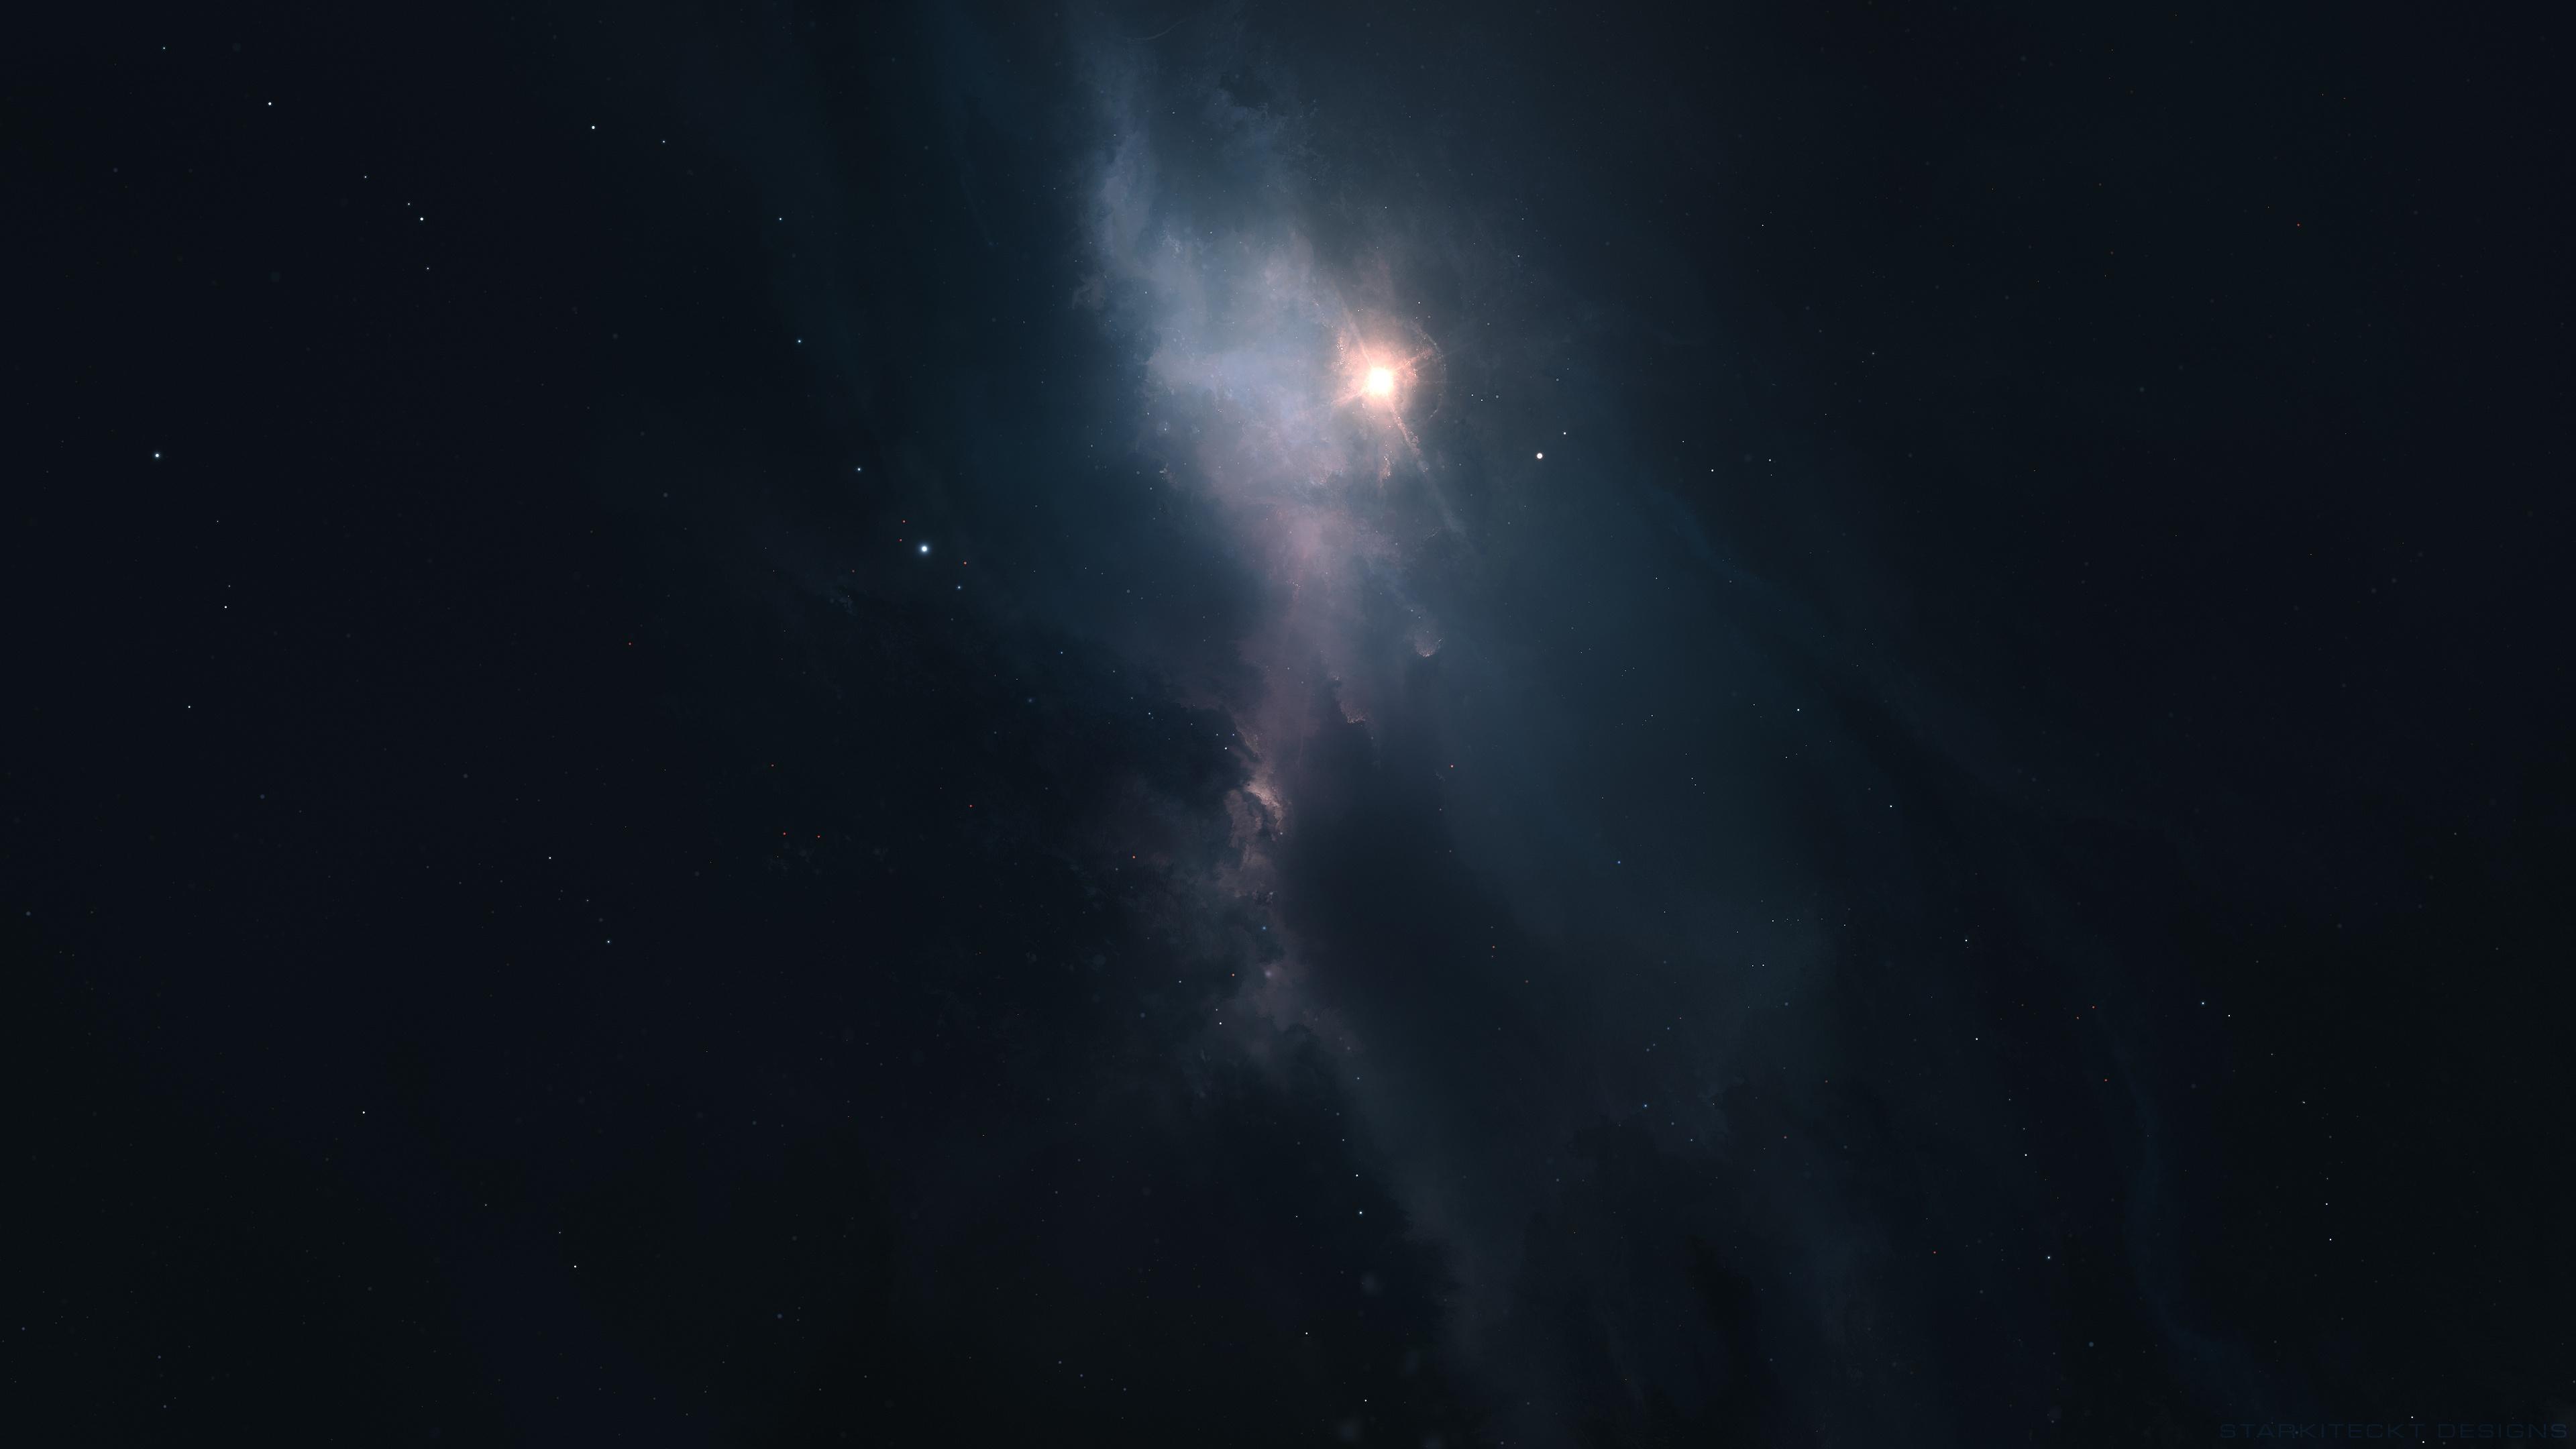 General 3840x2160 nebula stars galaxy universe space space art digital art Starkiteckt